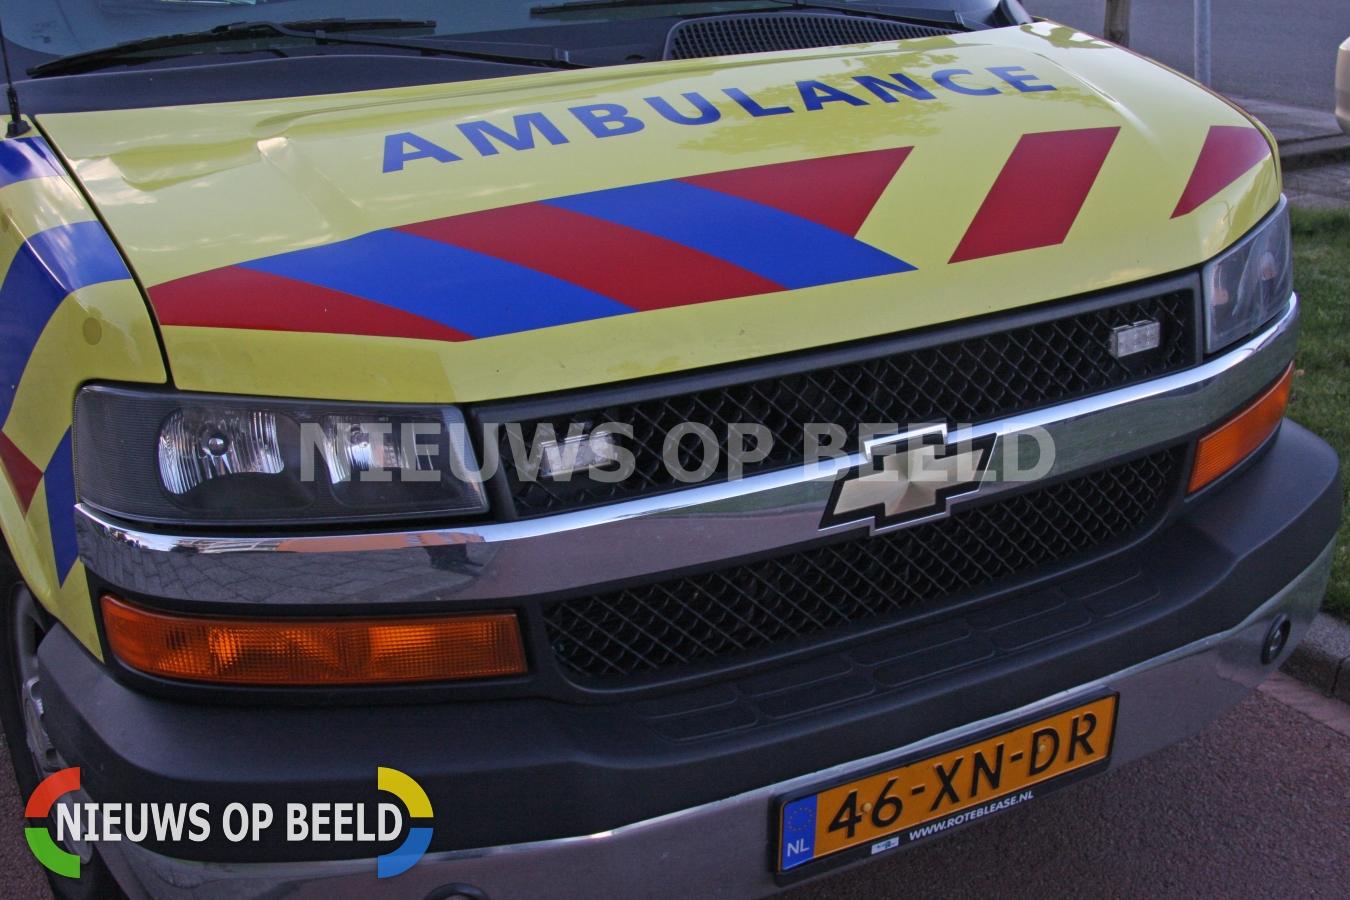 51-jarige man overleden na afsteken zware vuurwerkbom Medemblik